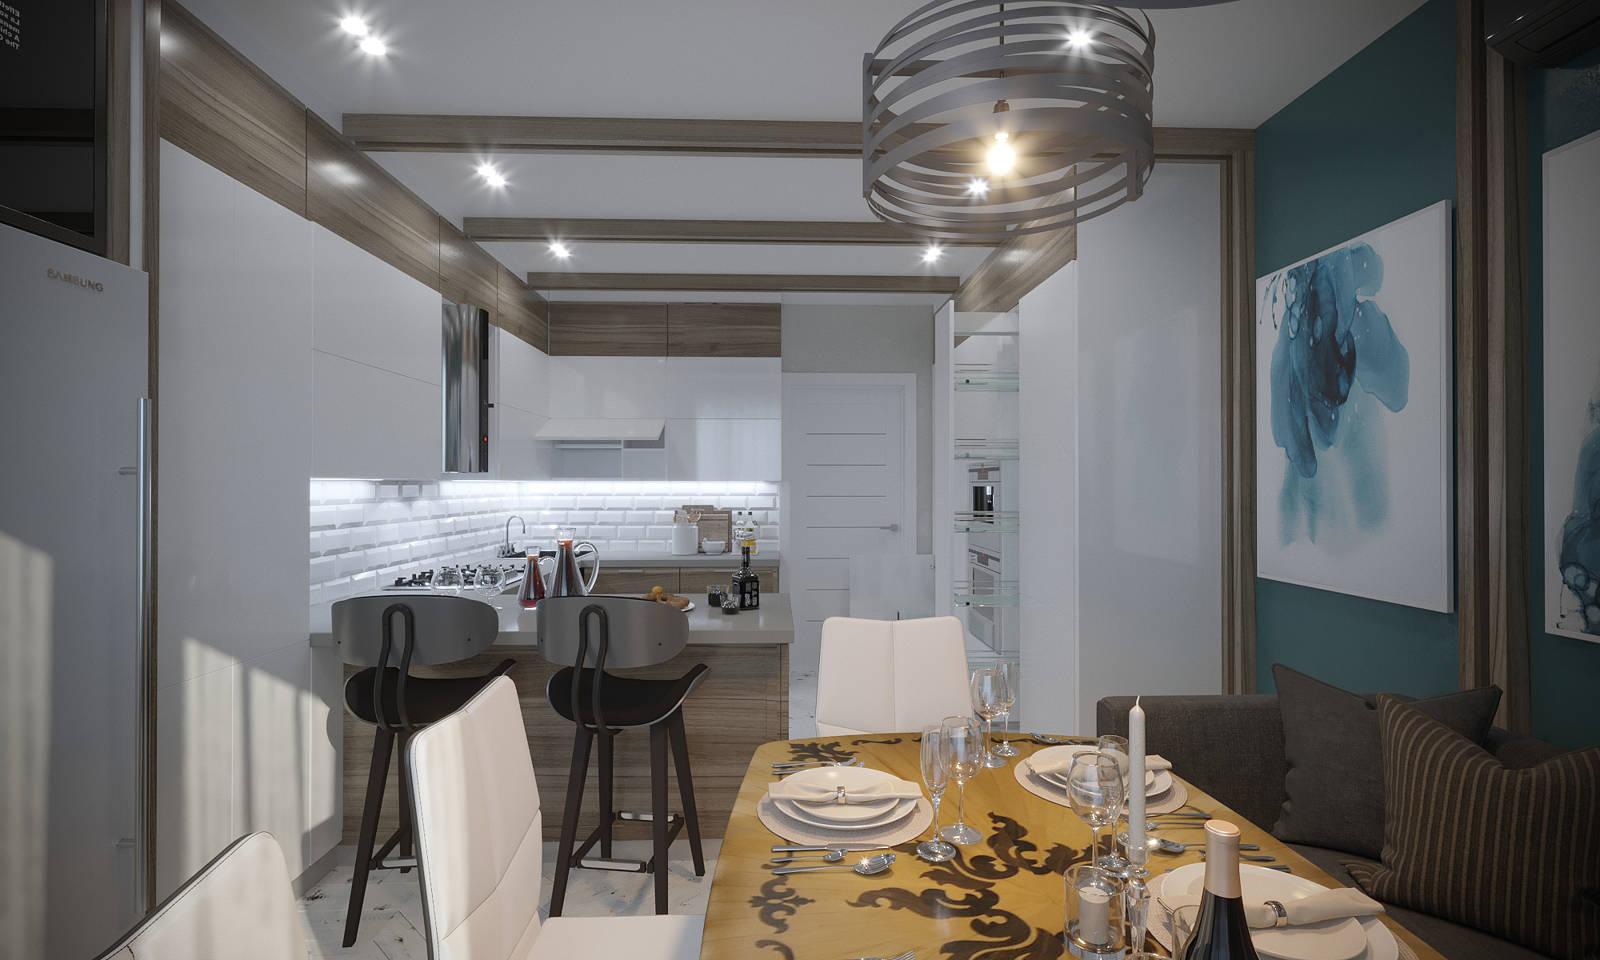 Дизайн кухни в квартире Киев в сканднавском стиле